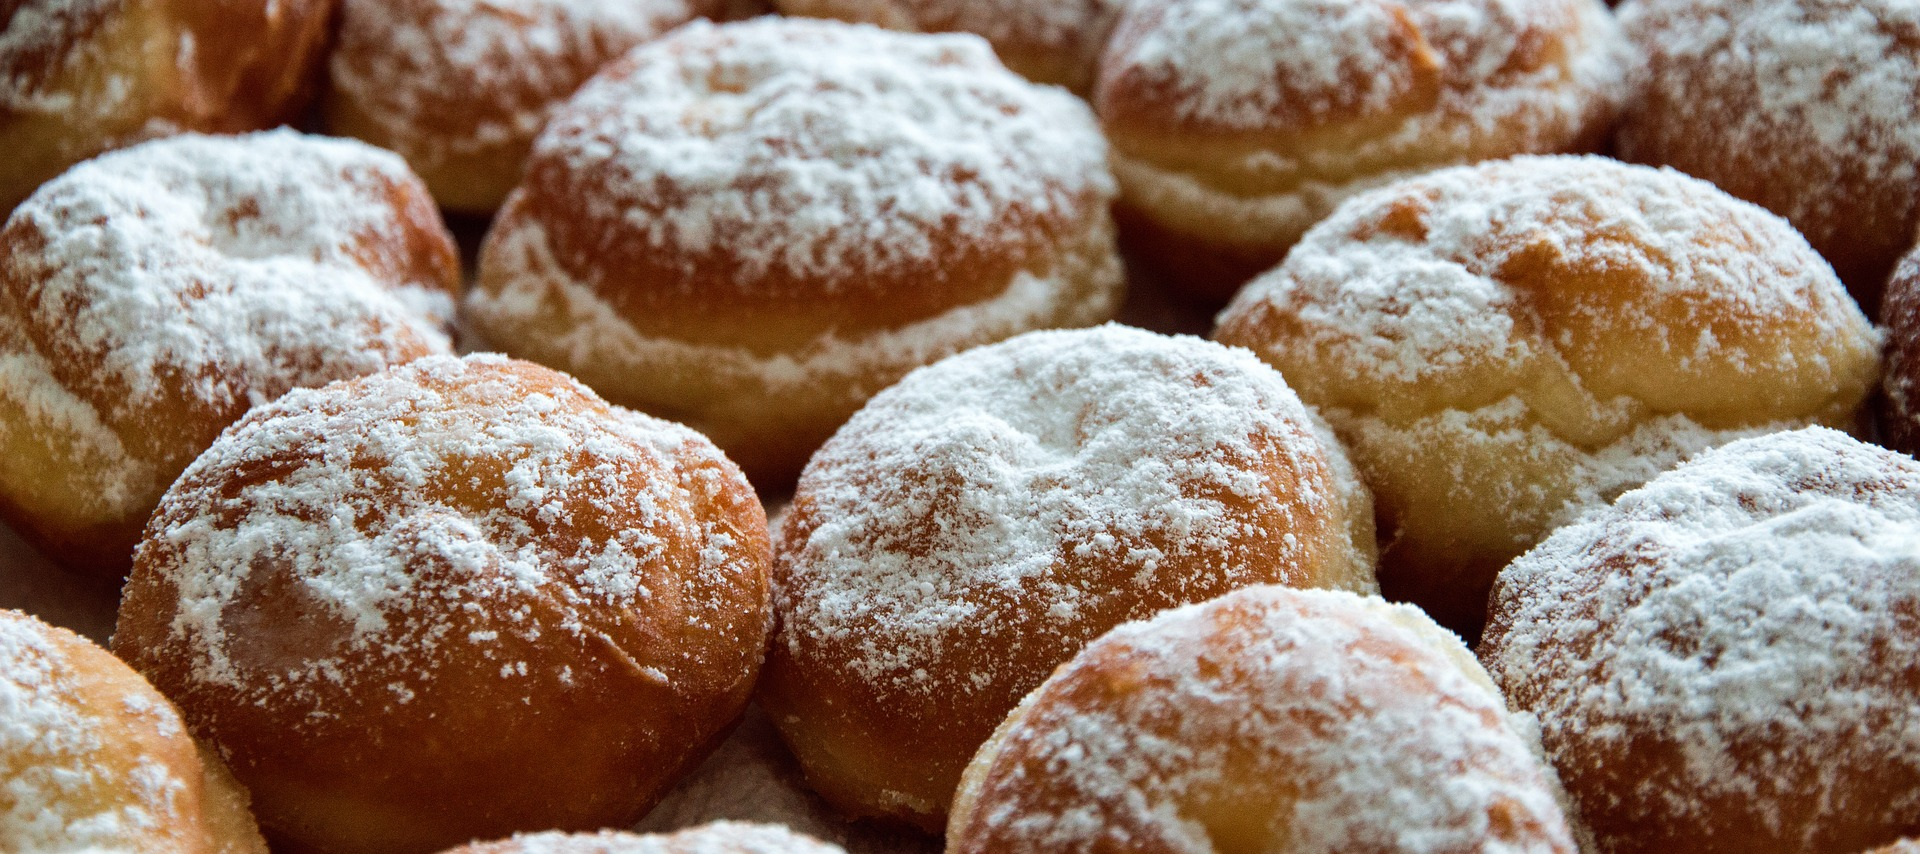 gogosi pudrate cu zahar - sfatulparintilor.ro - pixabay_com - buns-2040456_1920